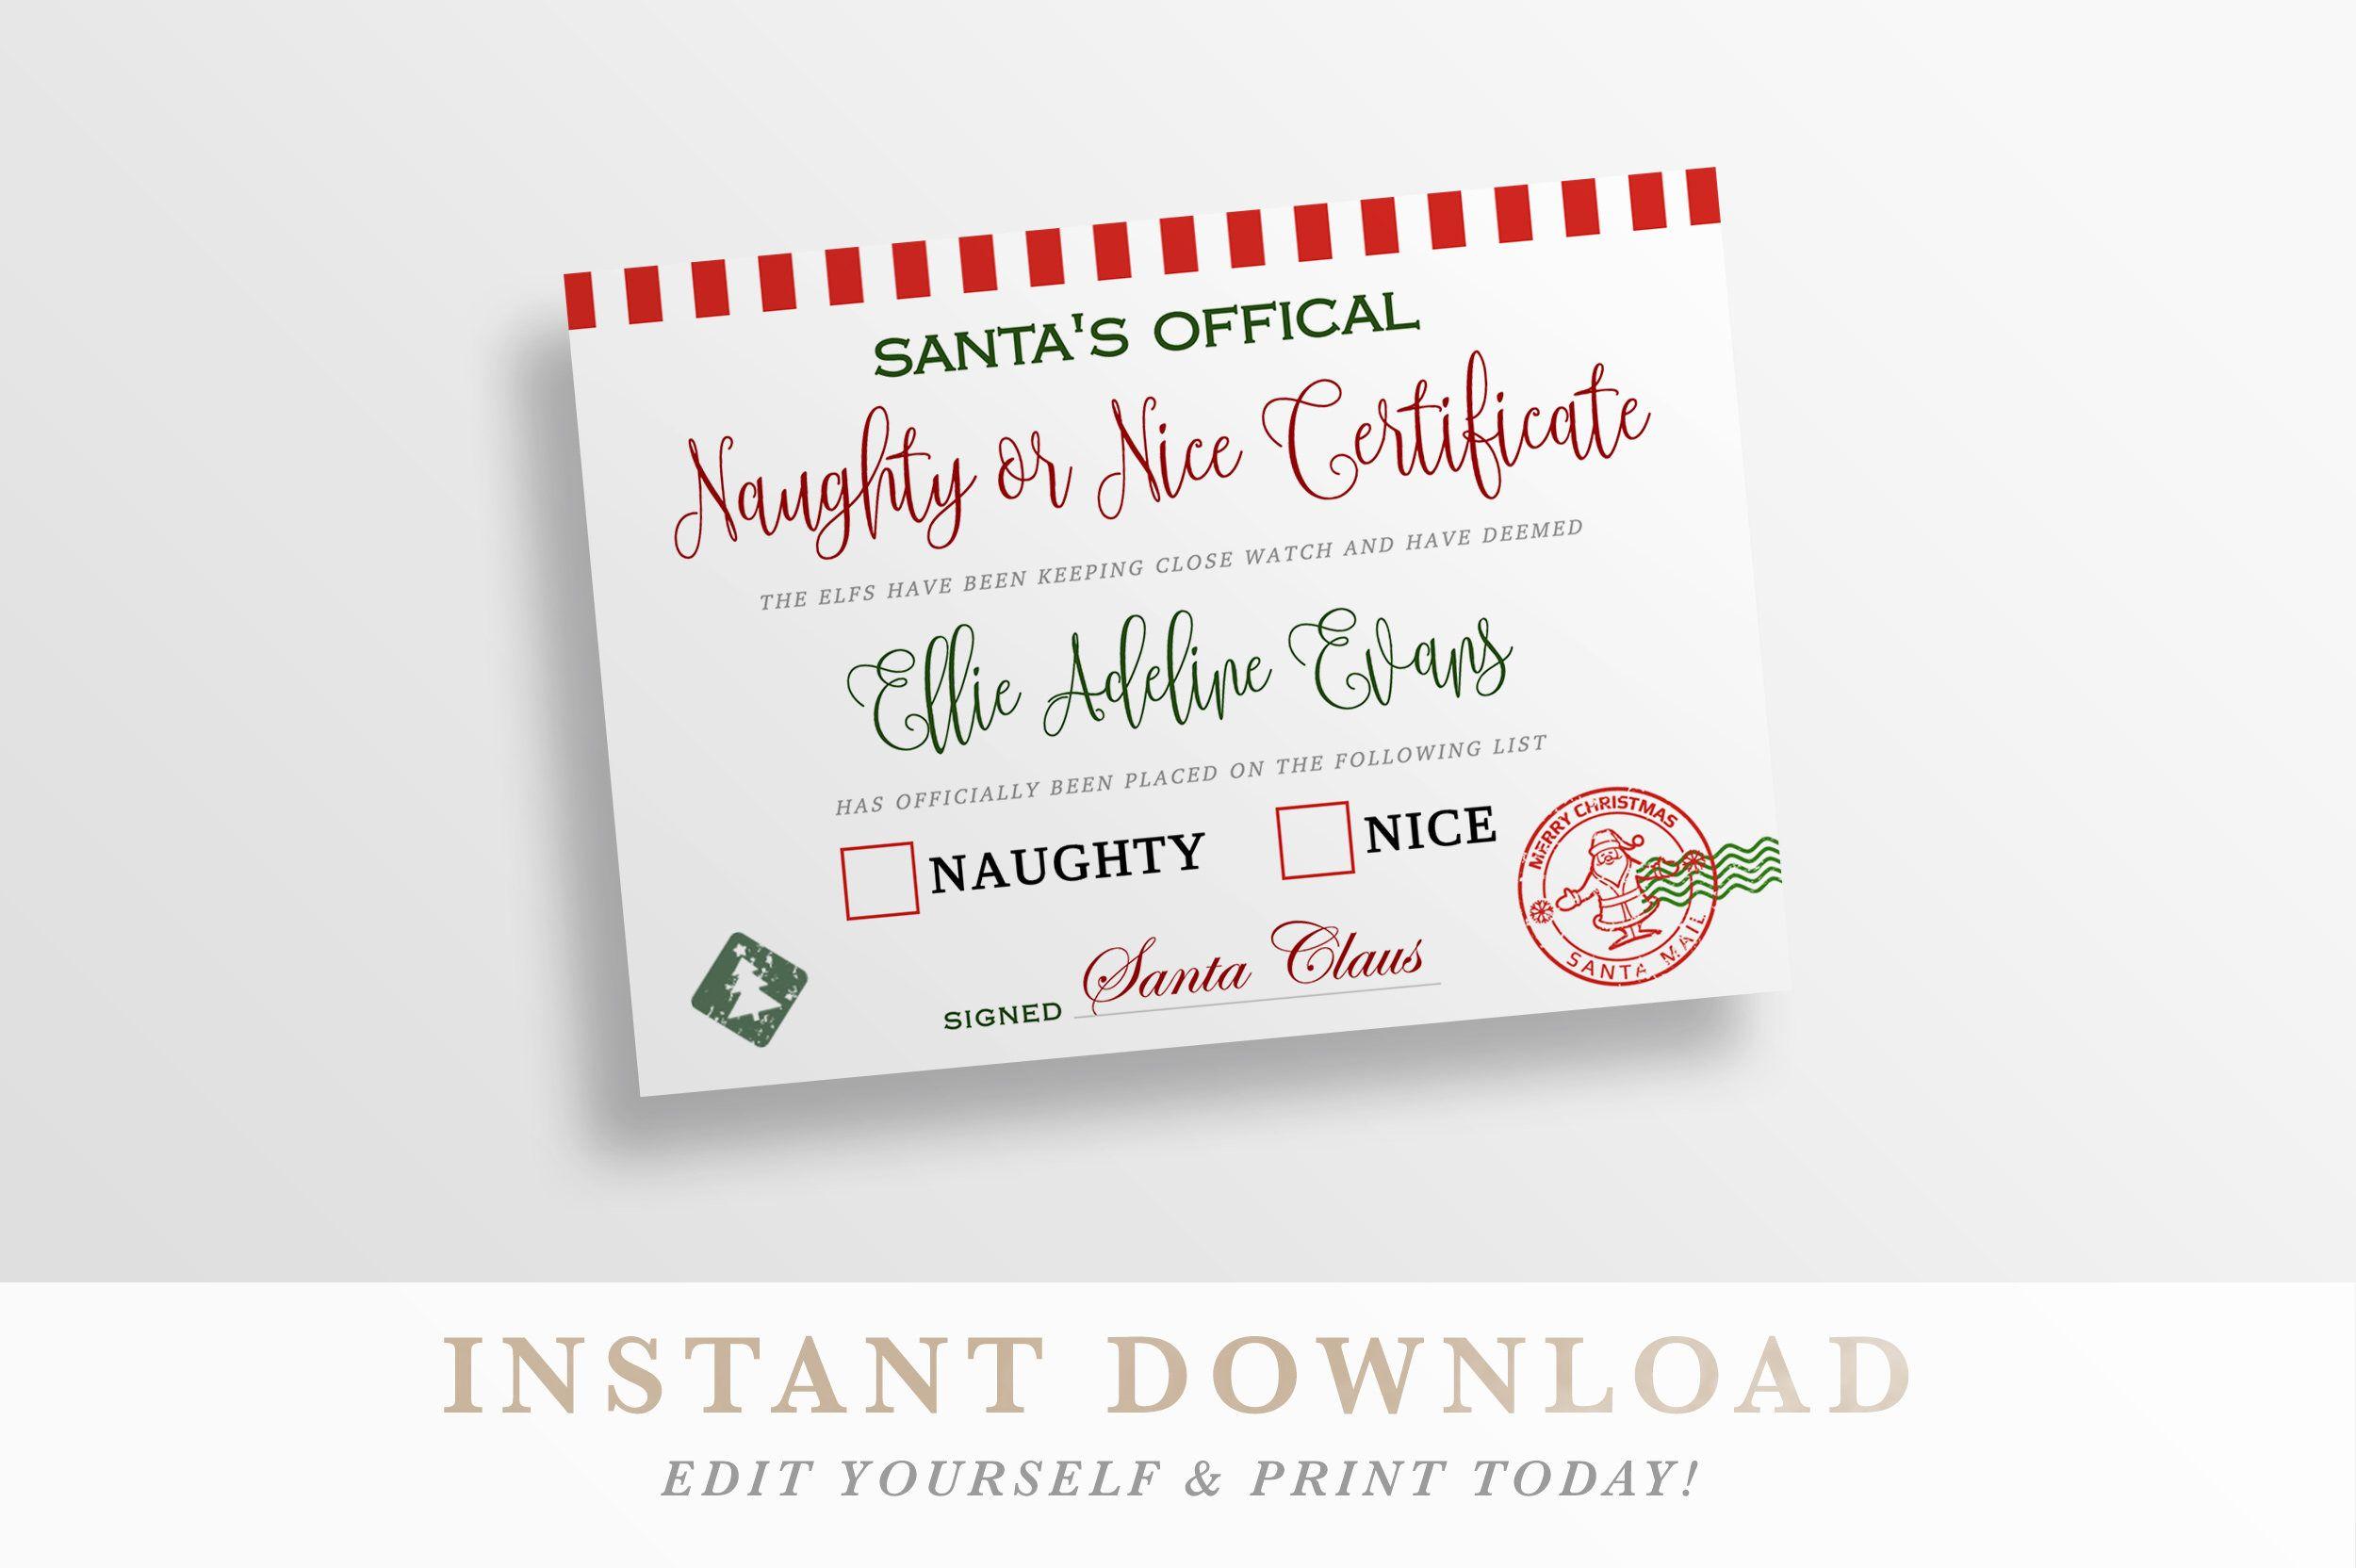 Naughty Or Nice Christmas Party Invitations Econhomes Com